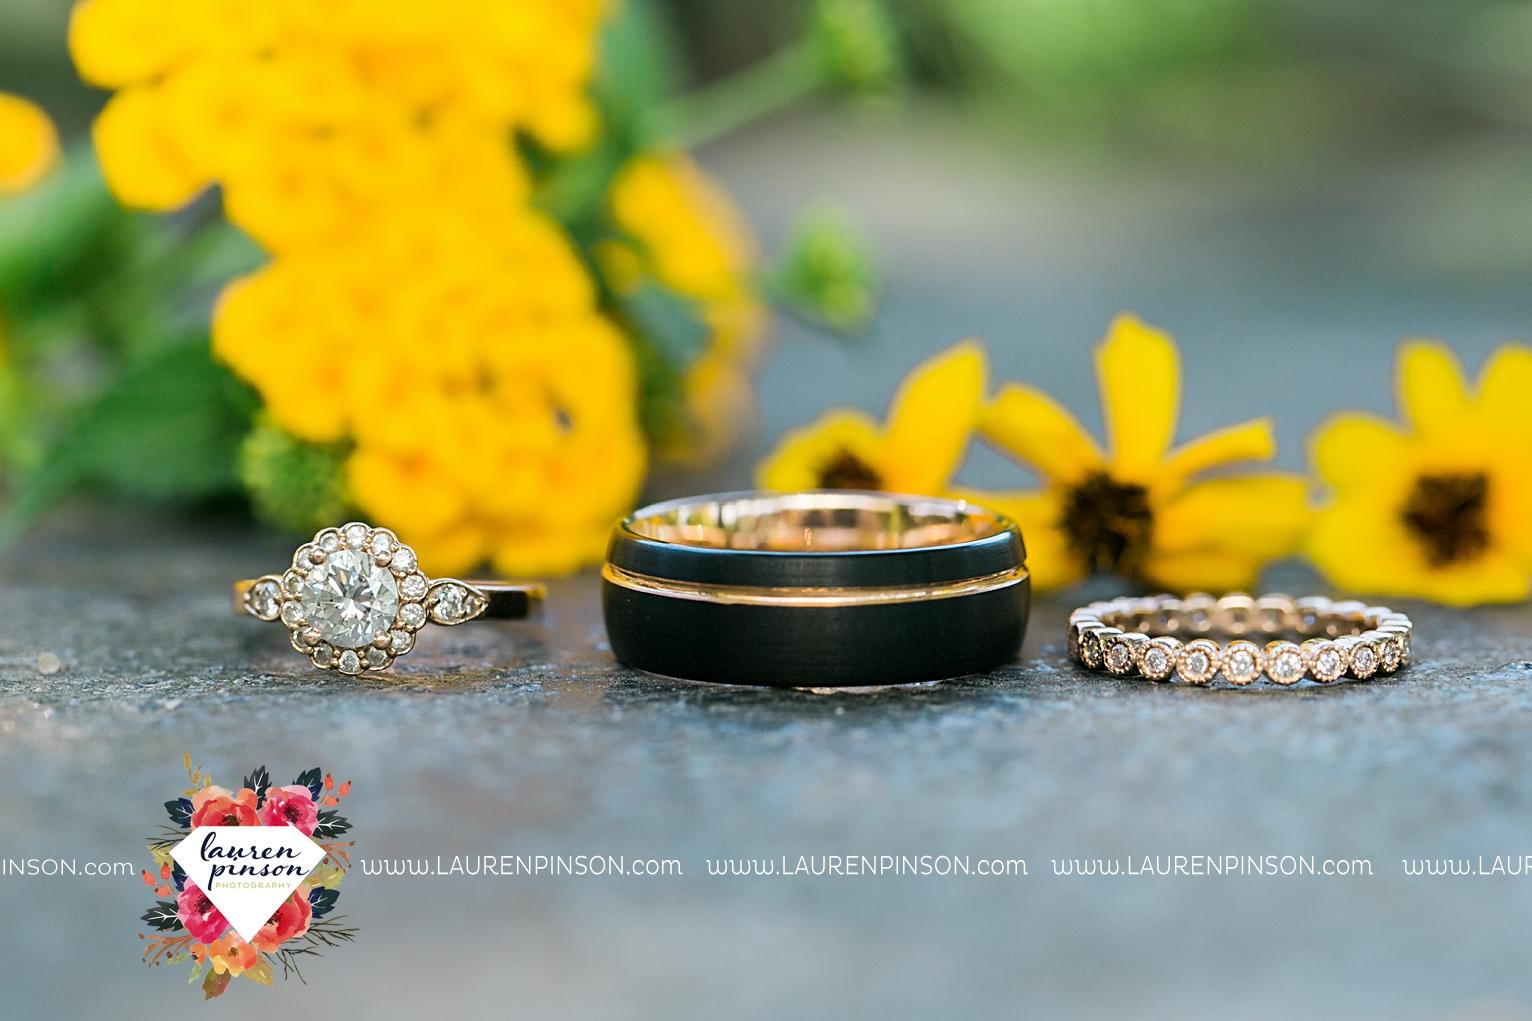 weatherford-texas-hollow-hill-farm-event-wedding-mineral-wells-dfw-wedding-photographer-wichita-falls-photography_3125.jpg